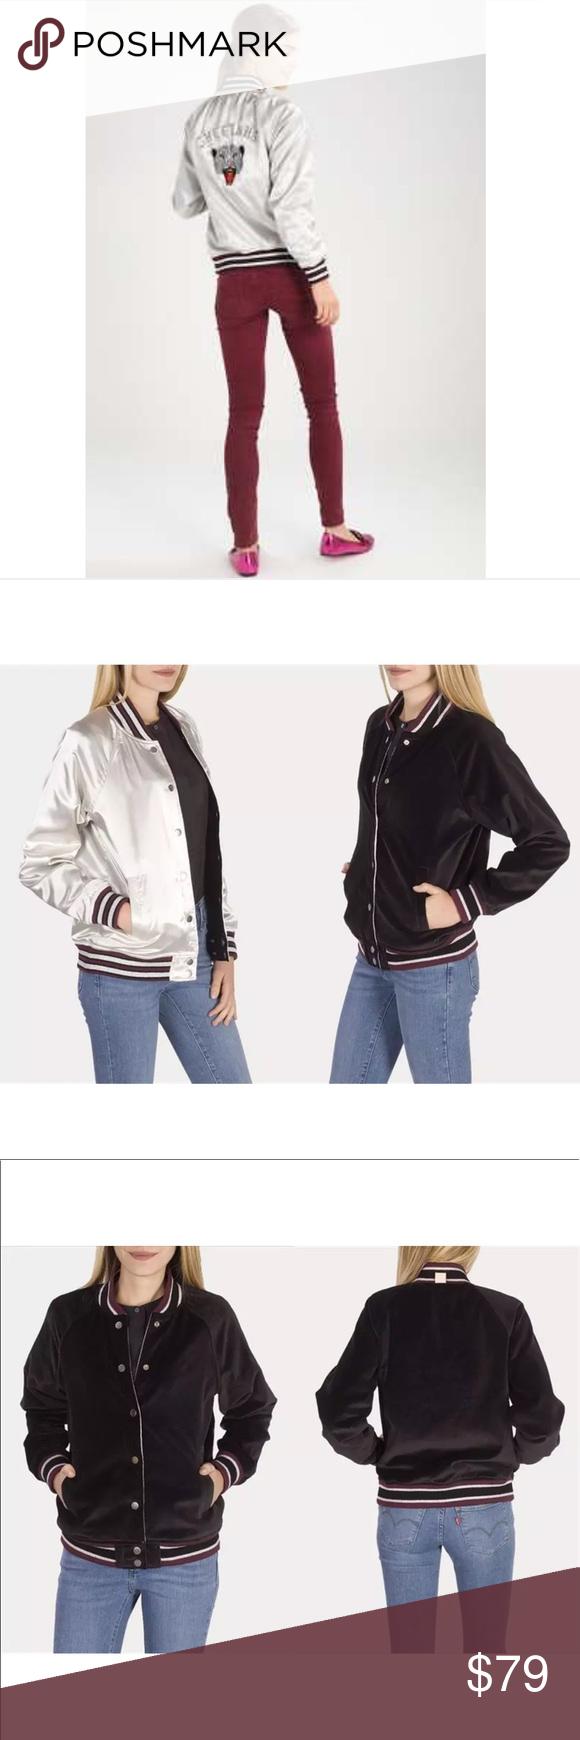 Nwt Ltd Levi S Reversible Black Grey Bomber Jacket Grey Bomber Jacket Jacket Brands Levi [ 1740 x 580 Pixel ]